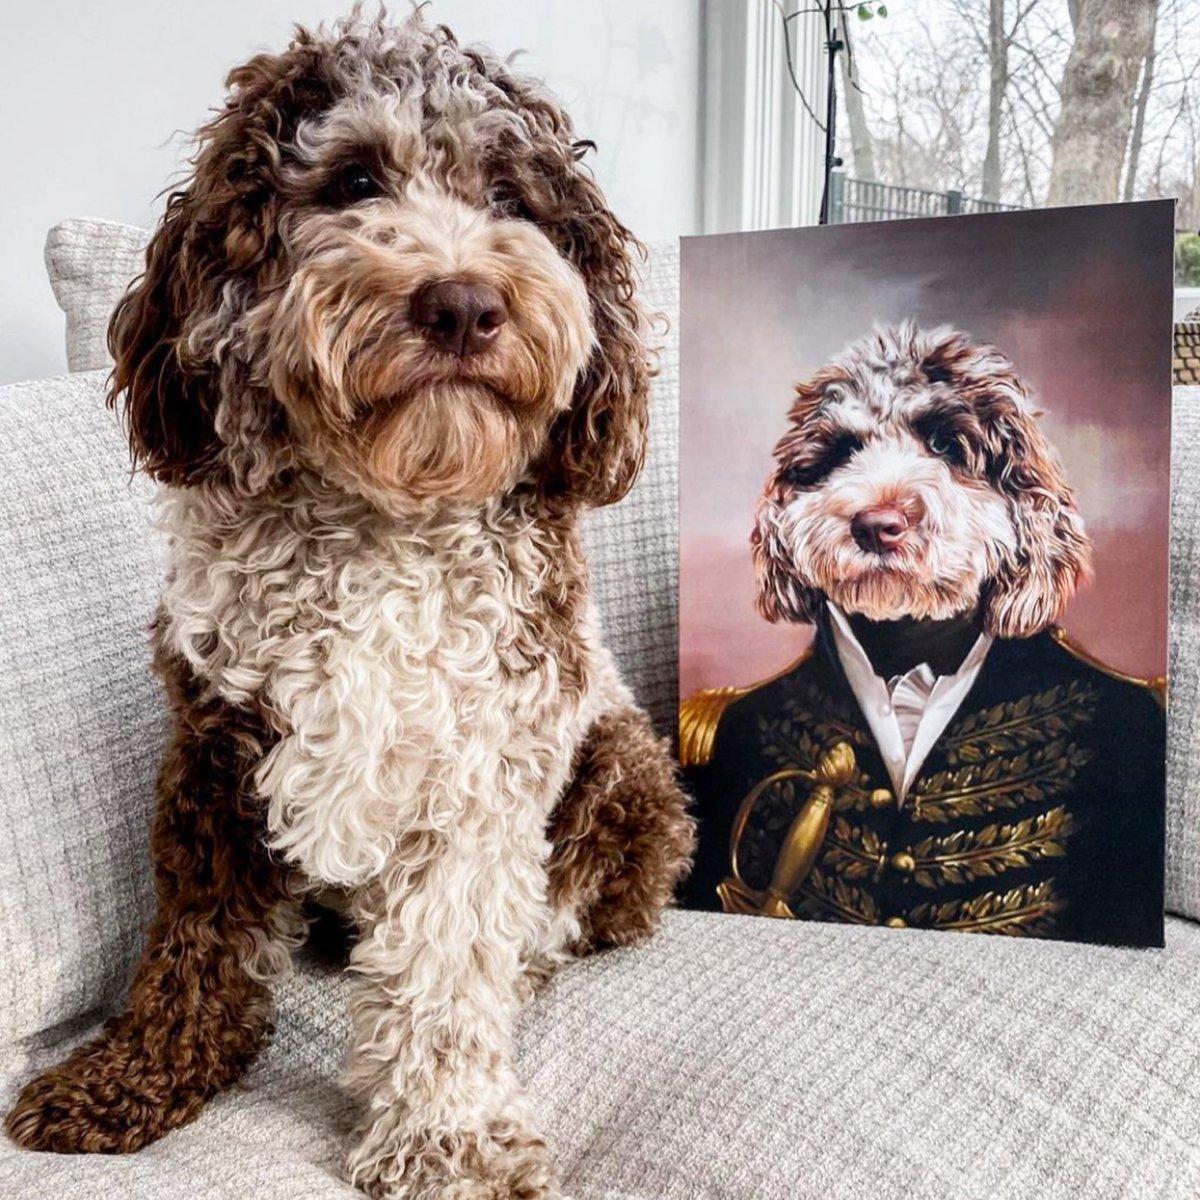 We LOVE this fur colour.  #dogloversfeed #dogloversonly #dogart #petlife #petstagram #petportraits #dogportraits #dogportrait #petstylist #dogstylist #petart #manchesterdogs #pettoys #pettreatspic.twitter.com/DpoEsbZRbr